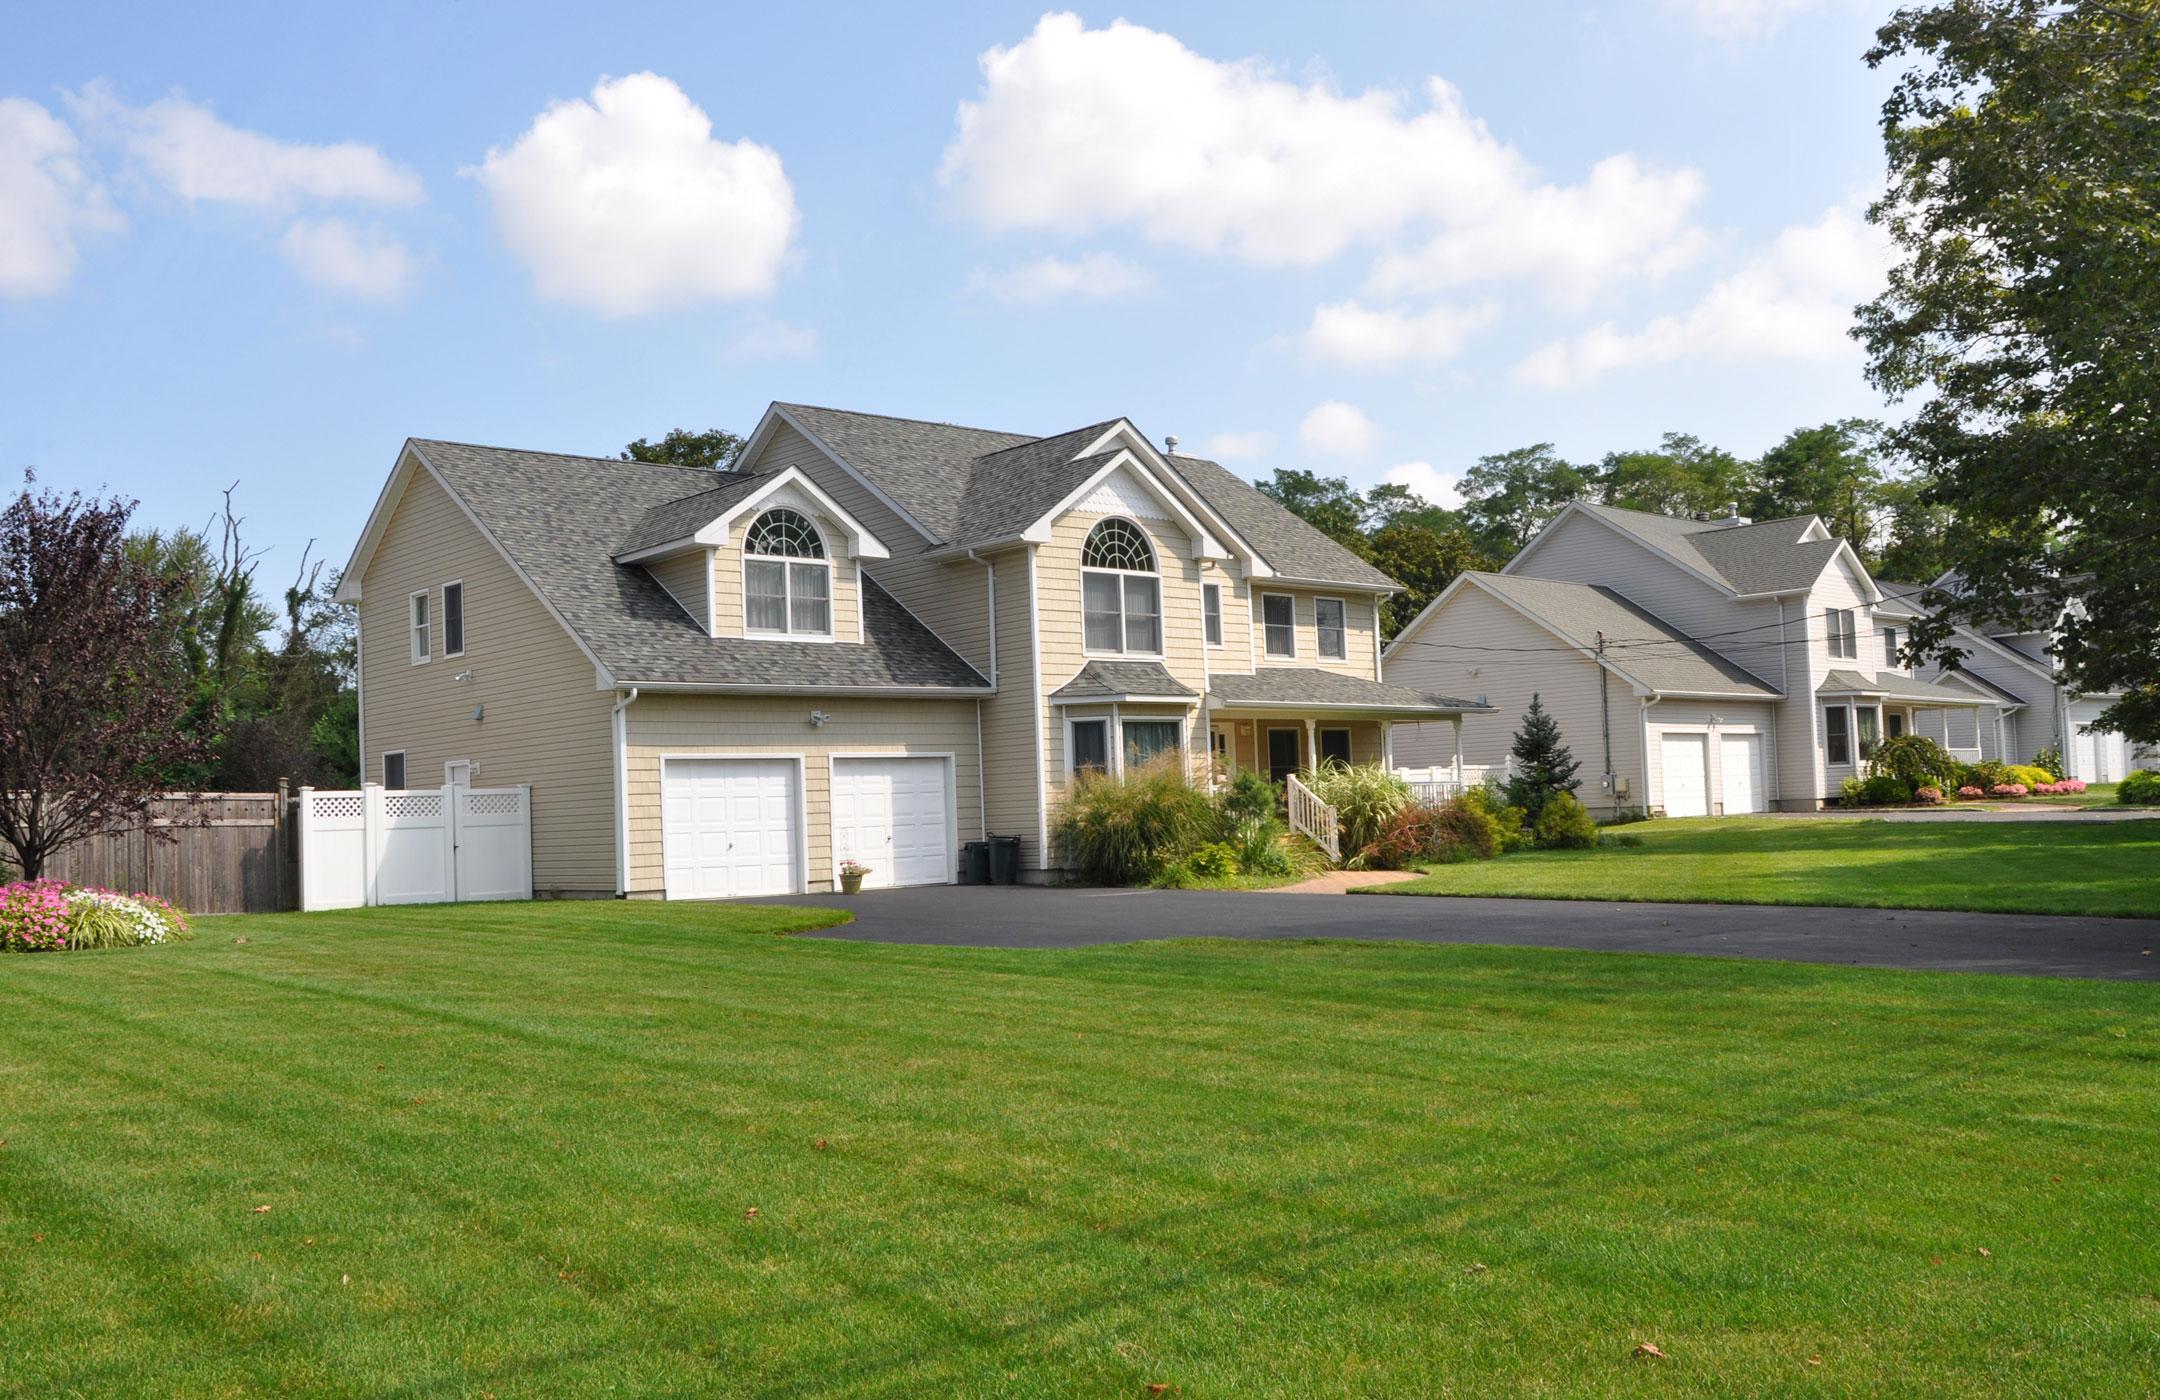 Nora Kechout Right At Home Realty Inc Brokerage